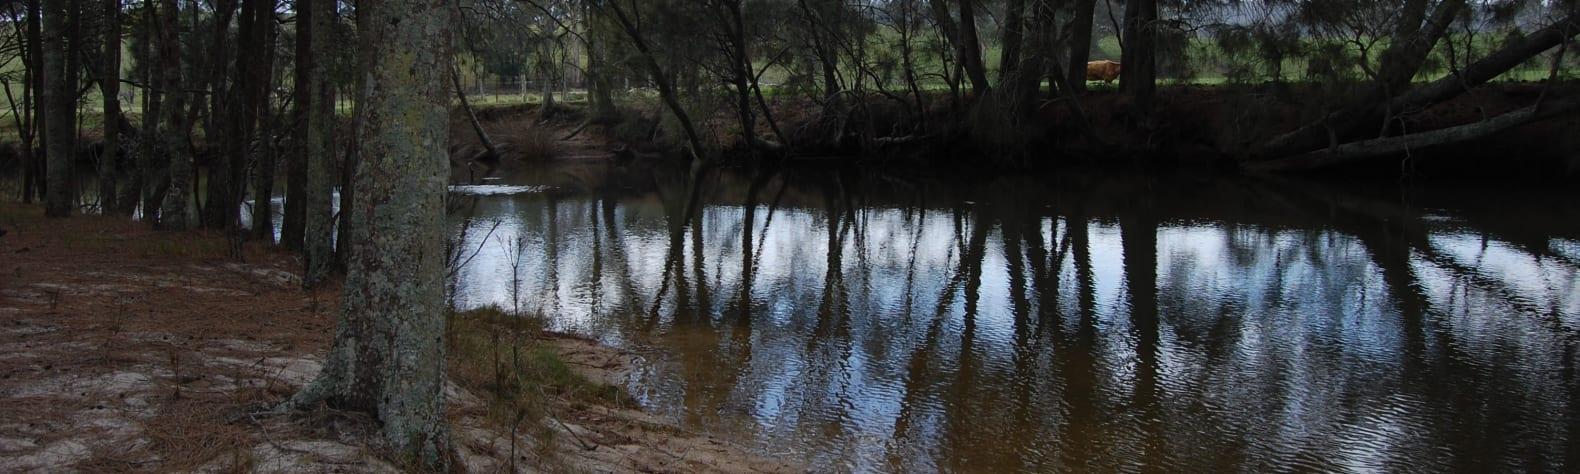 Tomakin River Camping